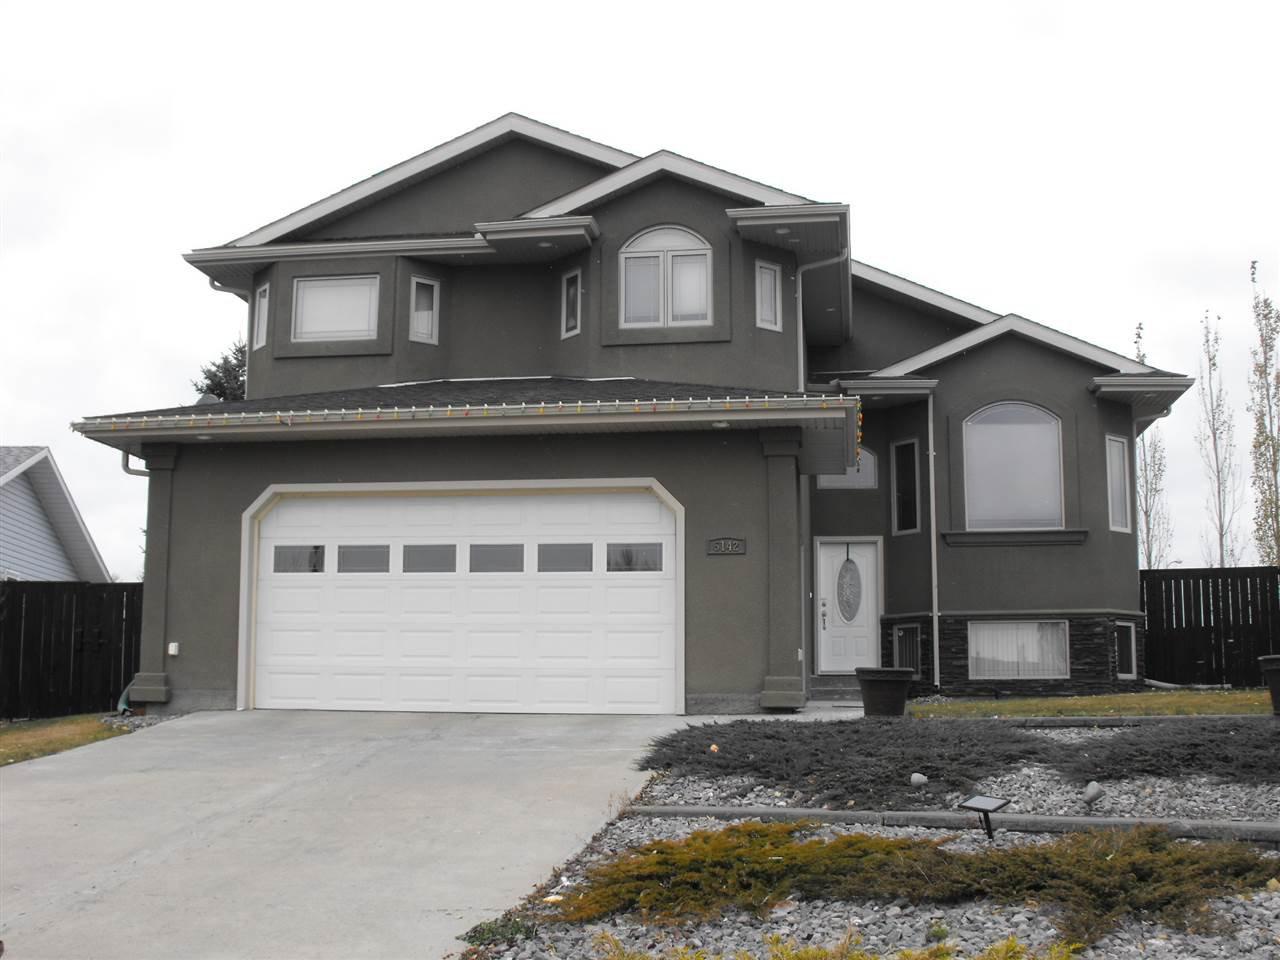 Main Photo: 5142 59 Avenue: Elk Point House for sale : MLS®# E4219050